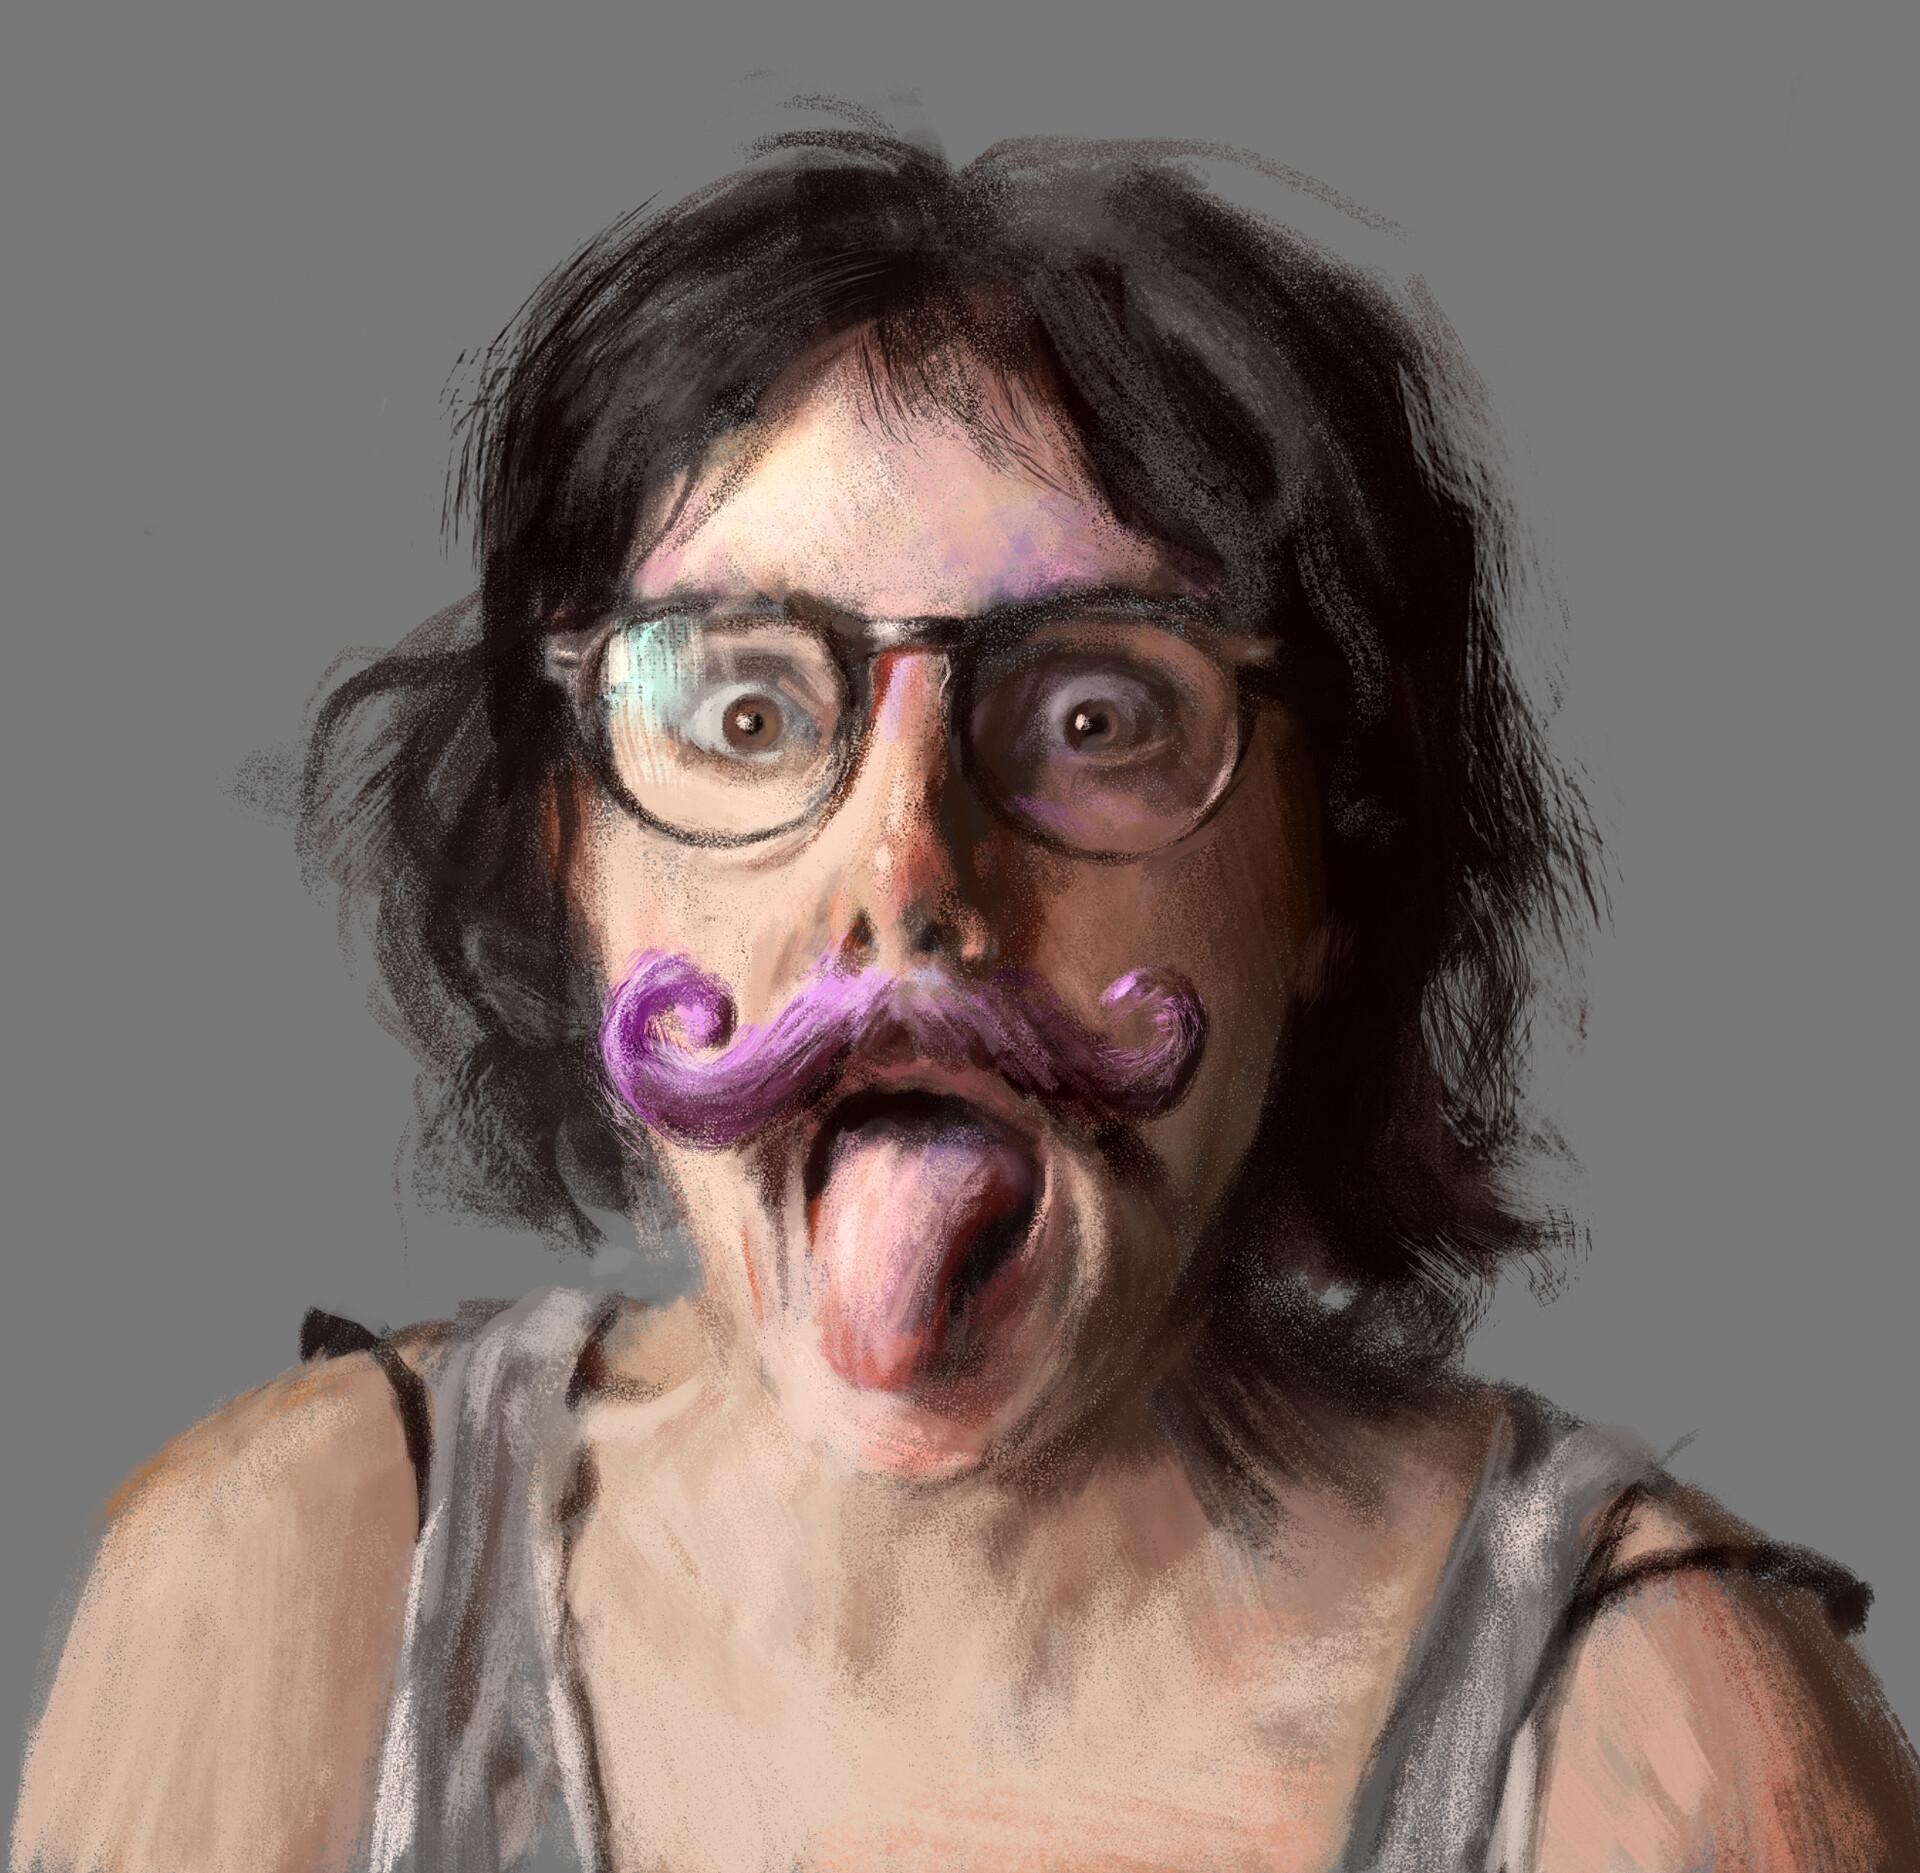 Jonathan hardesty julia portrait mustache bigjpg